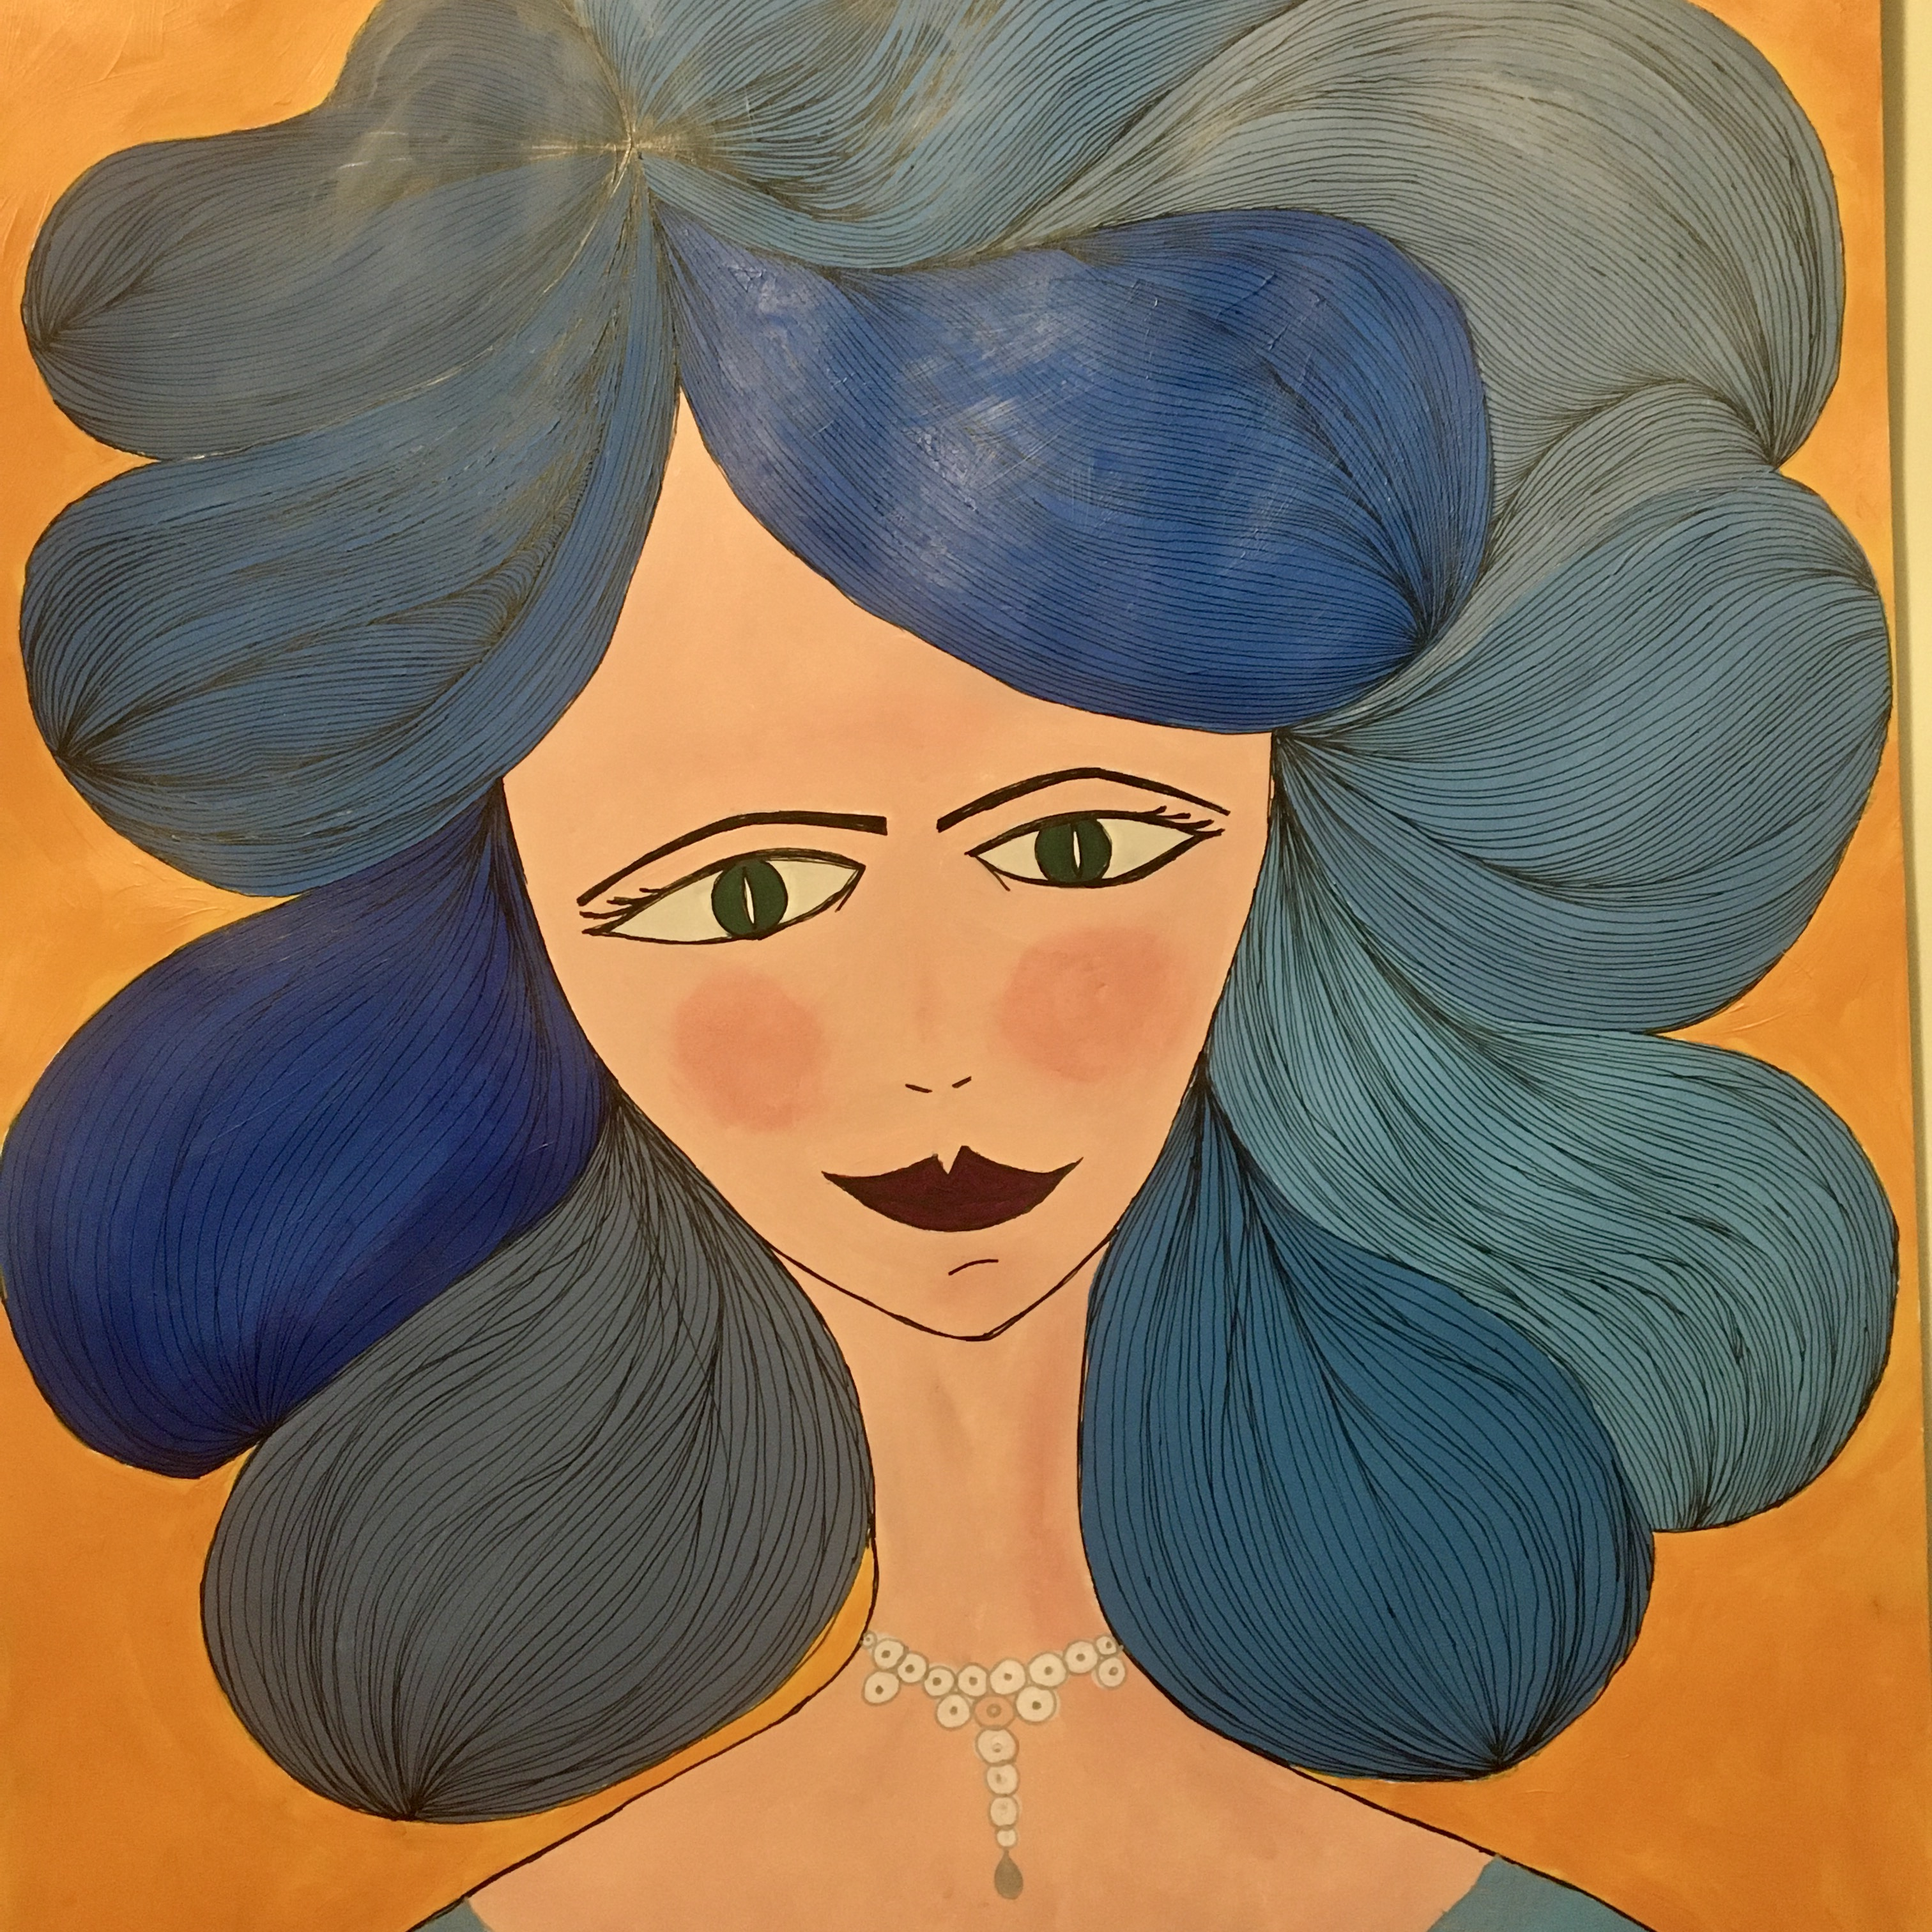 Minina Original art on paper